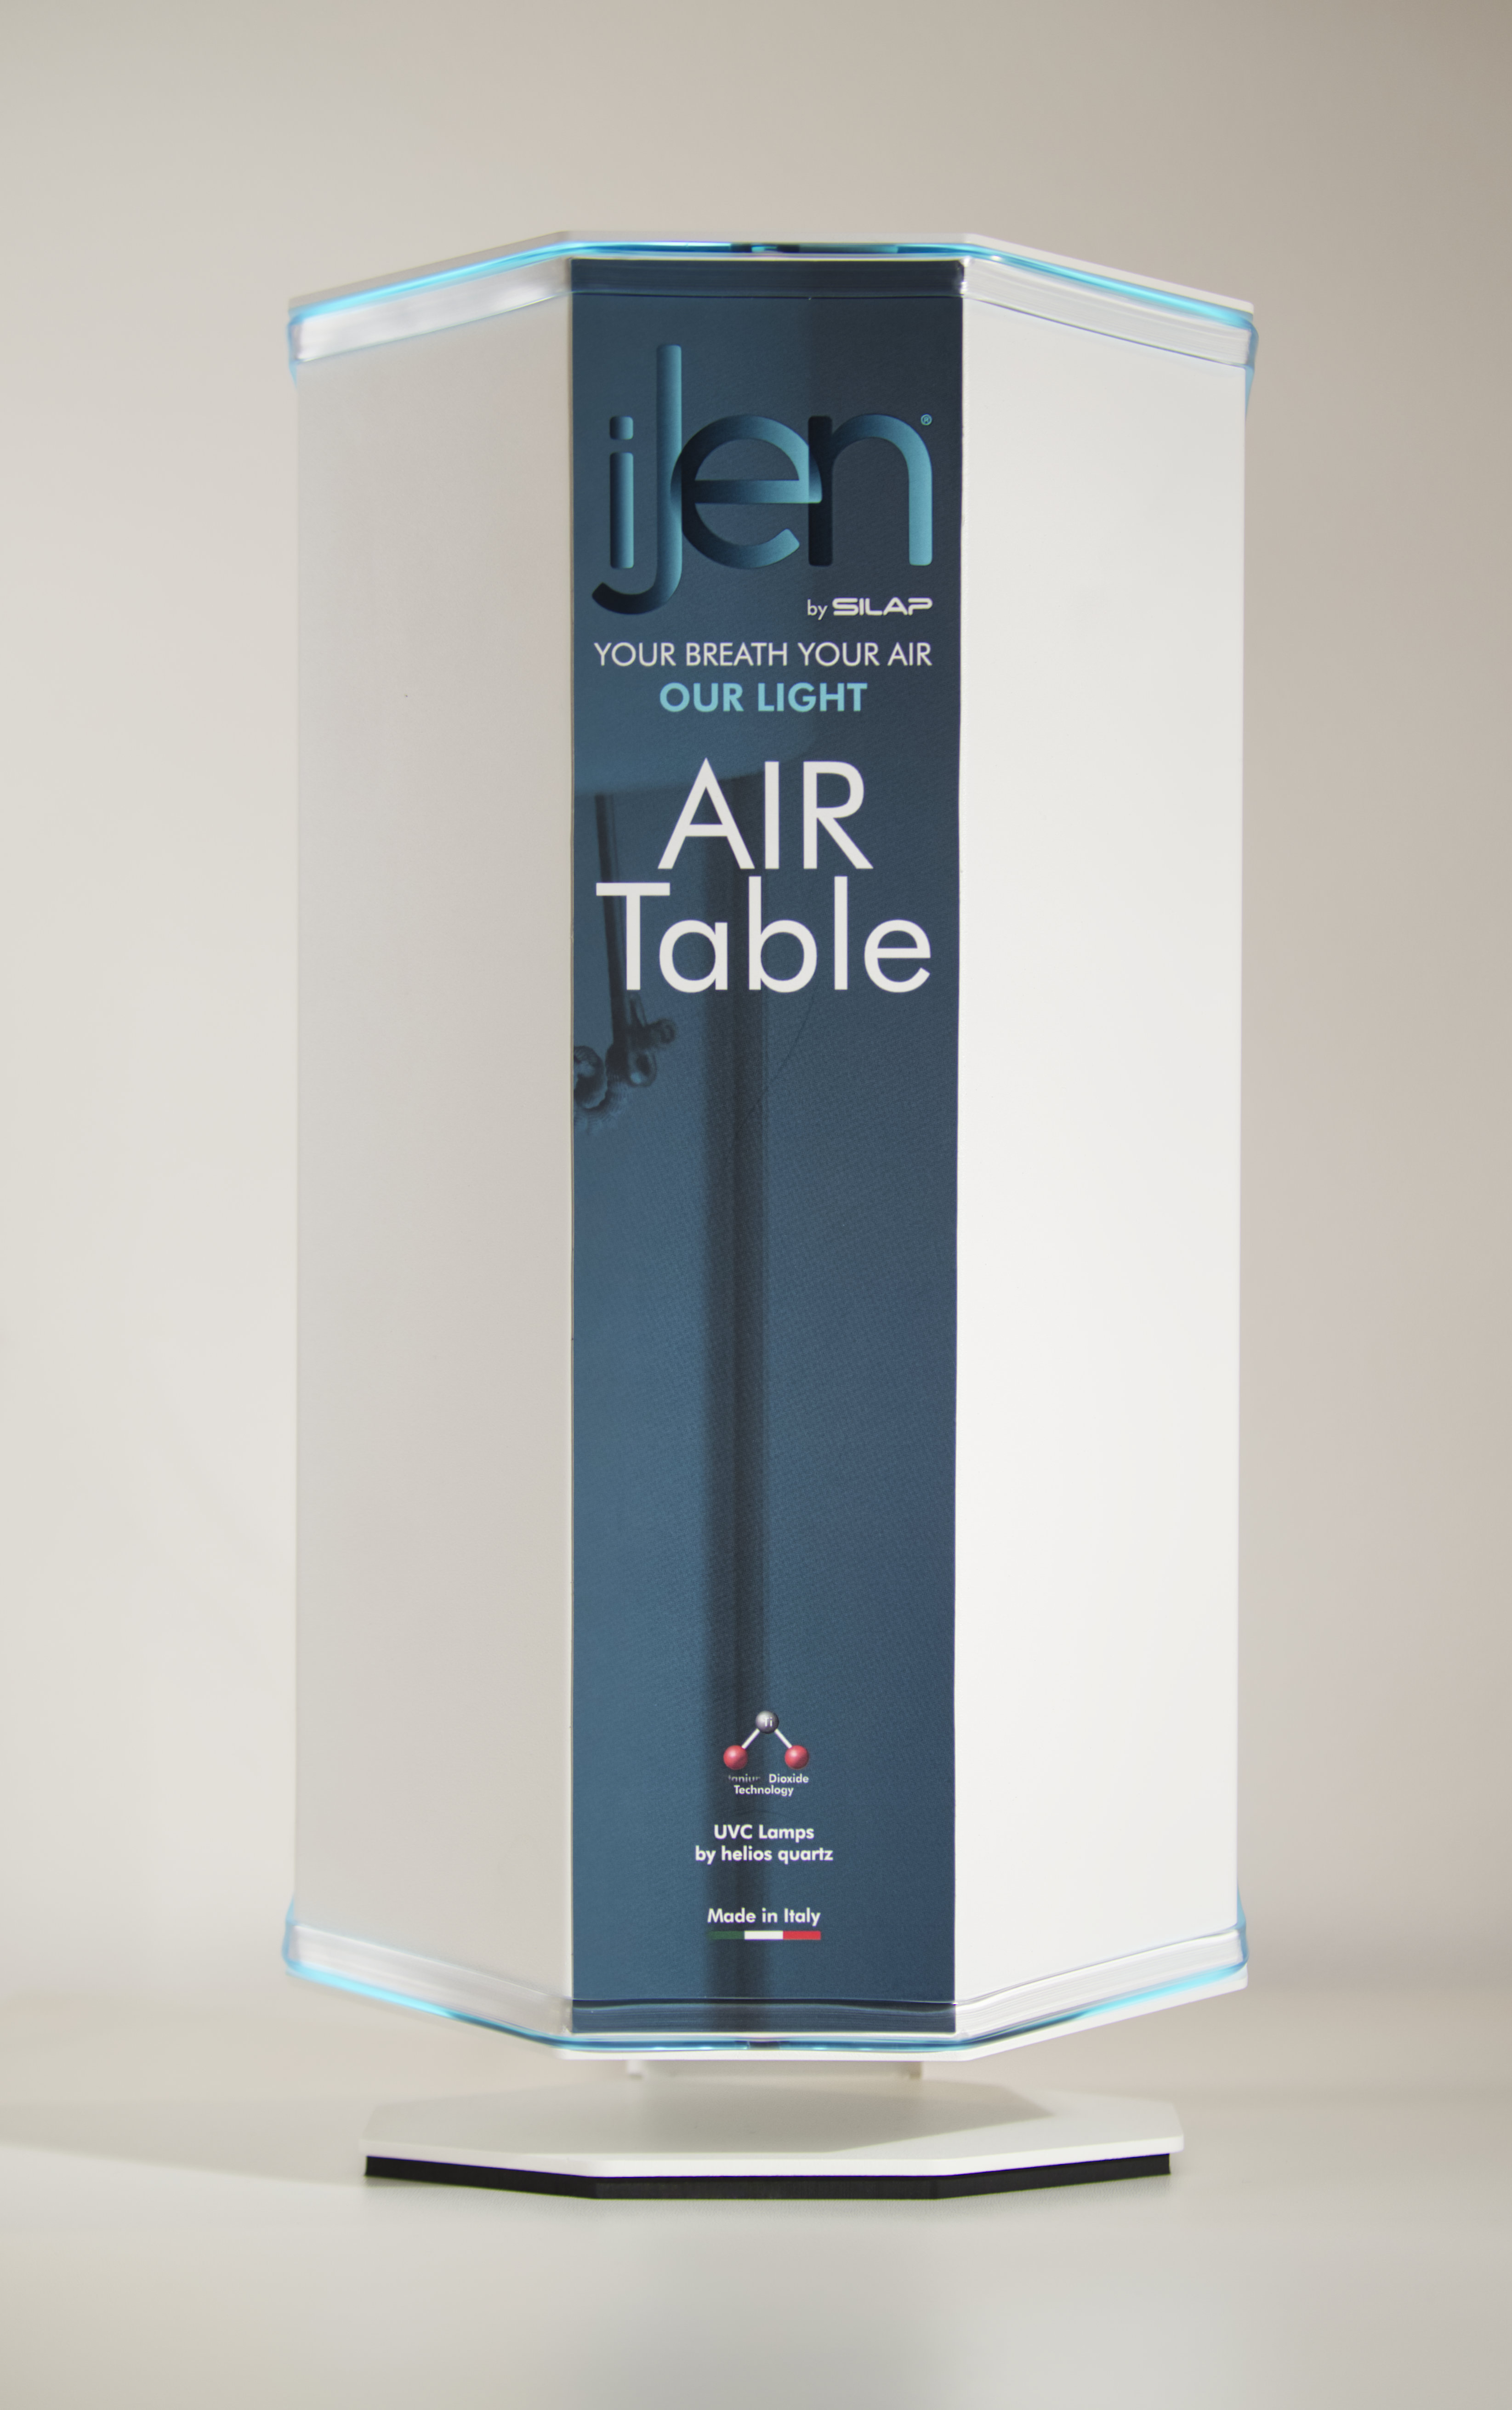 iJen AIR Table 01